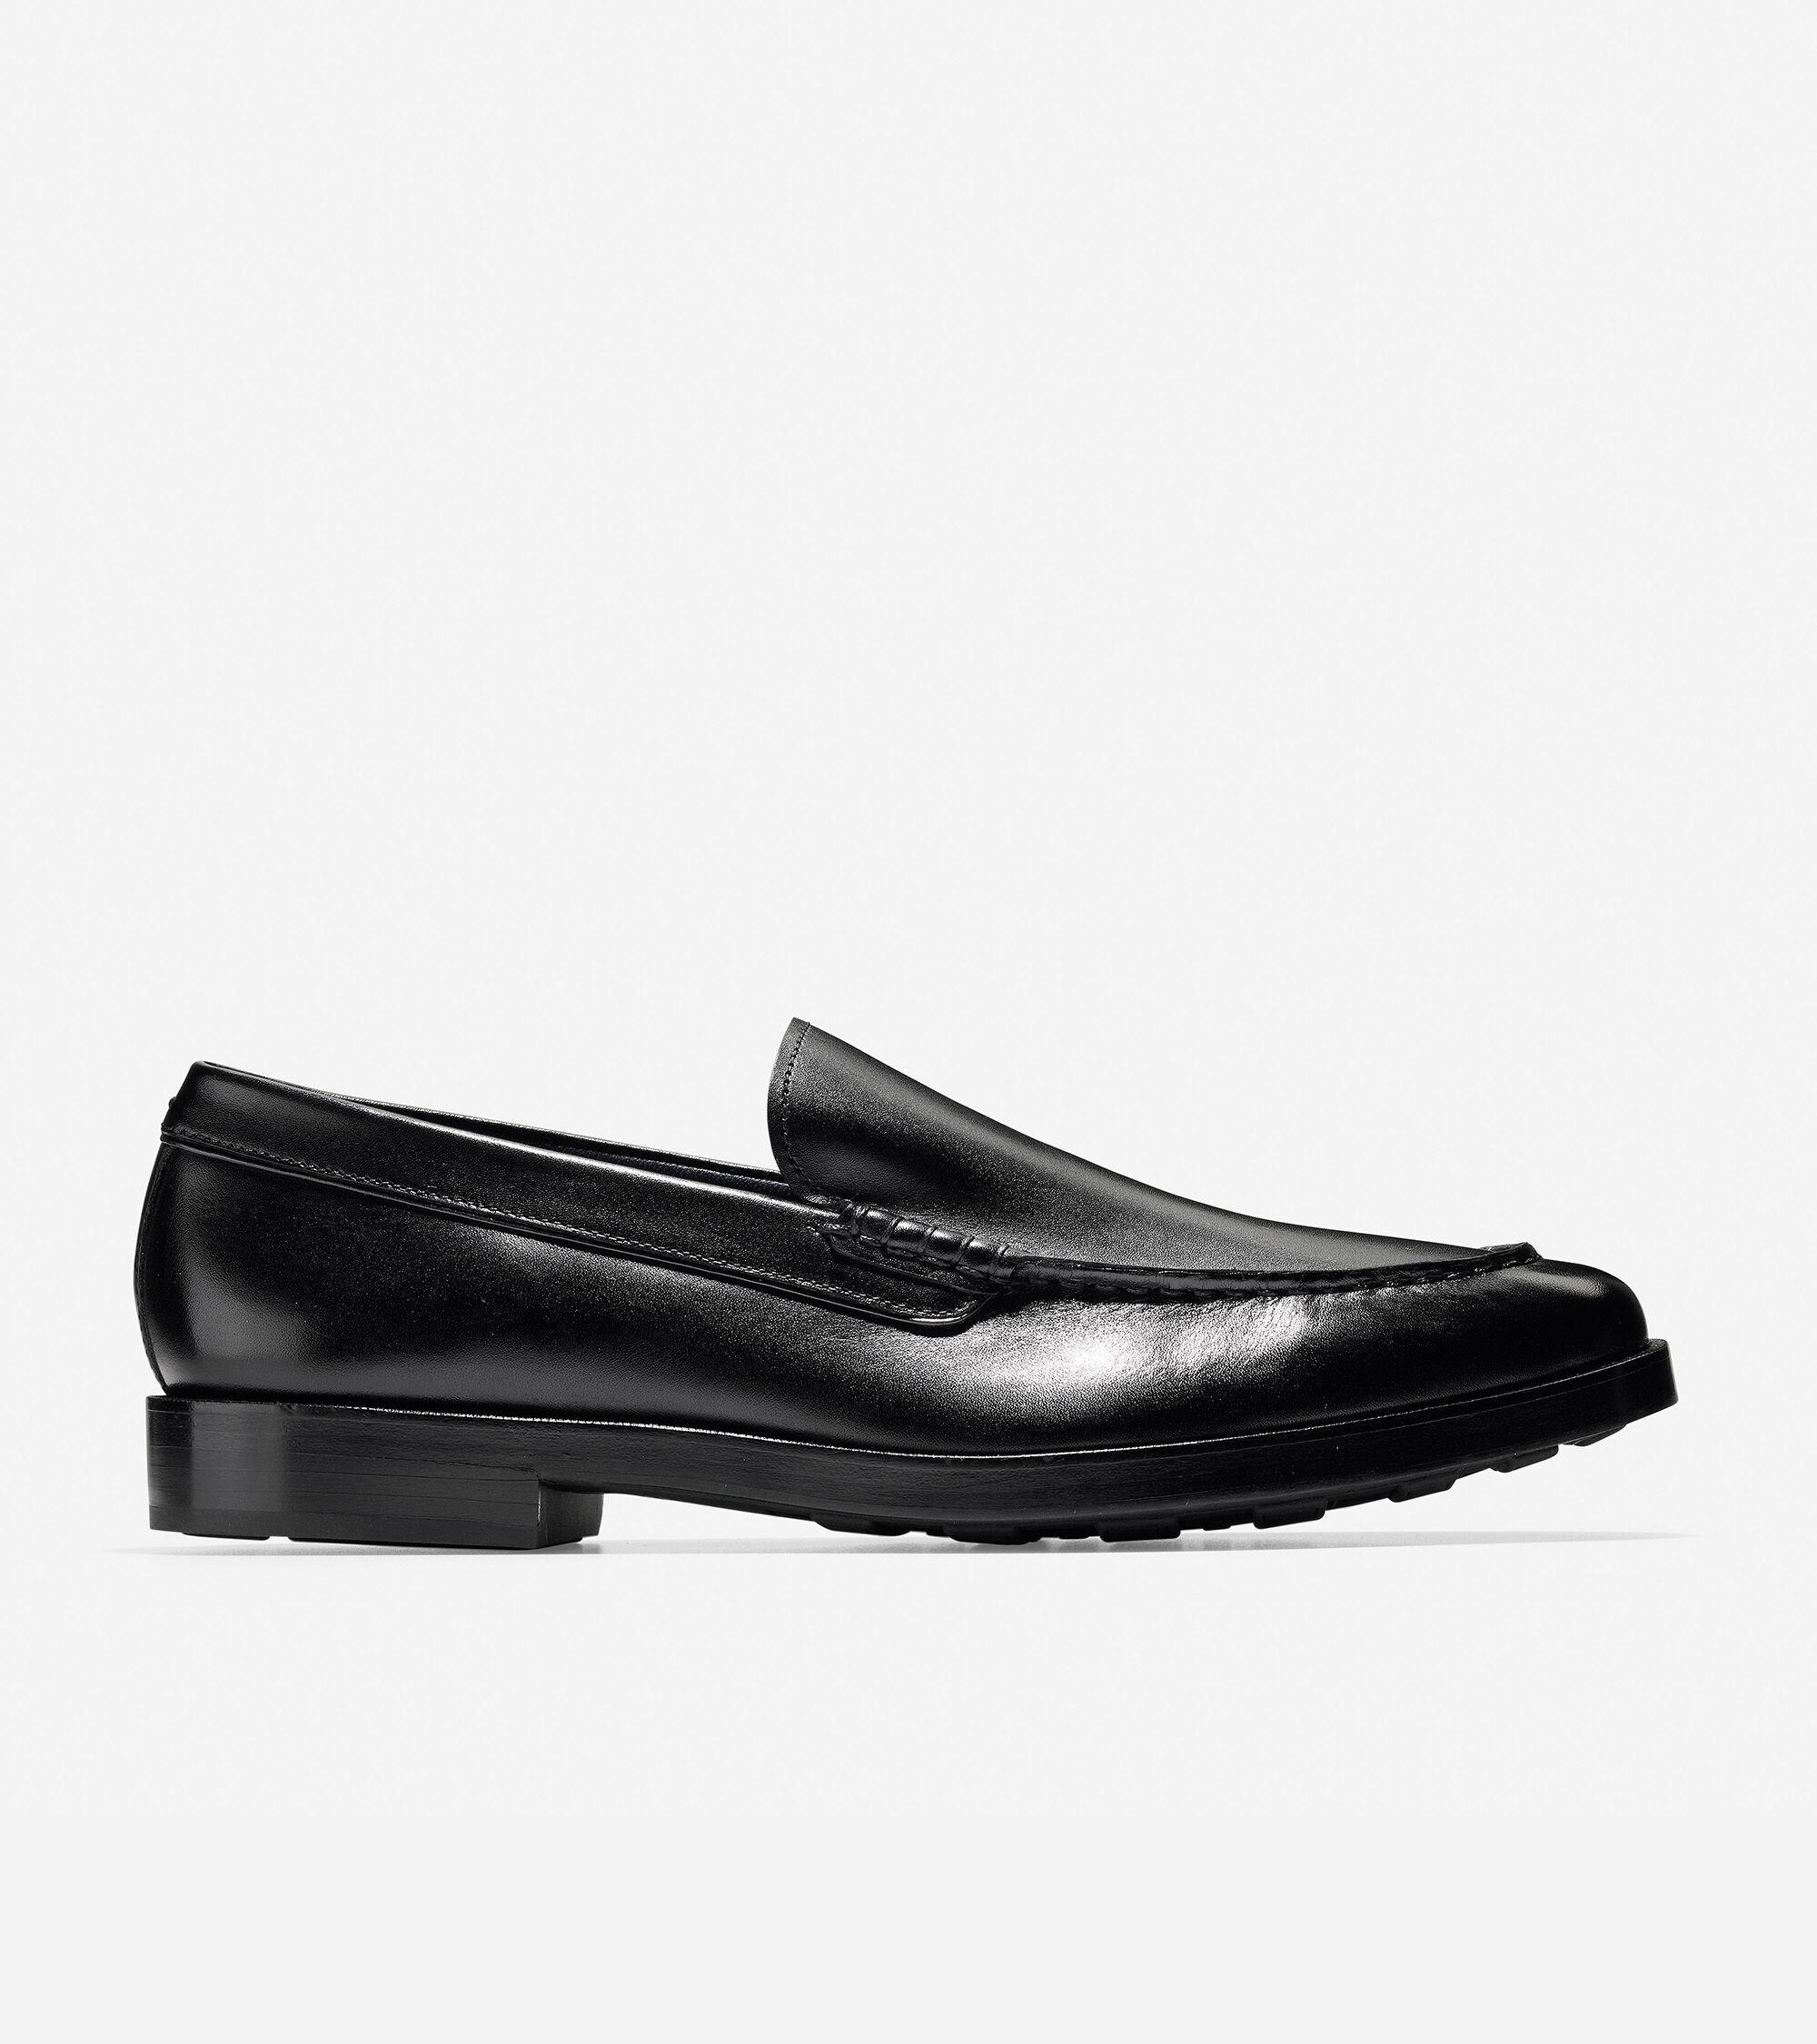 a0a39347916 Men s Hamilton Grand Venetian Loafers in Black